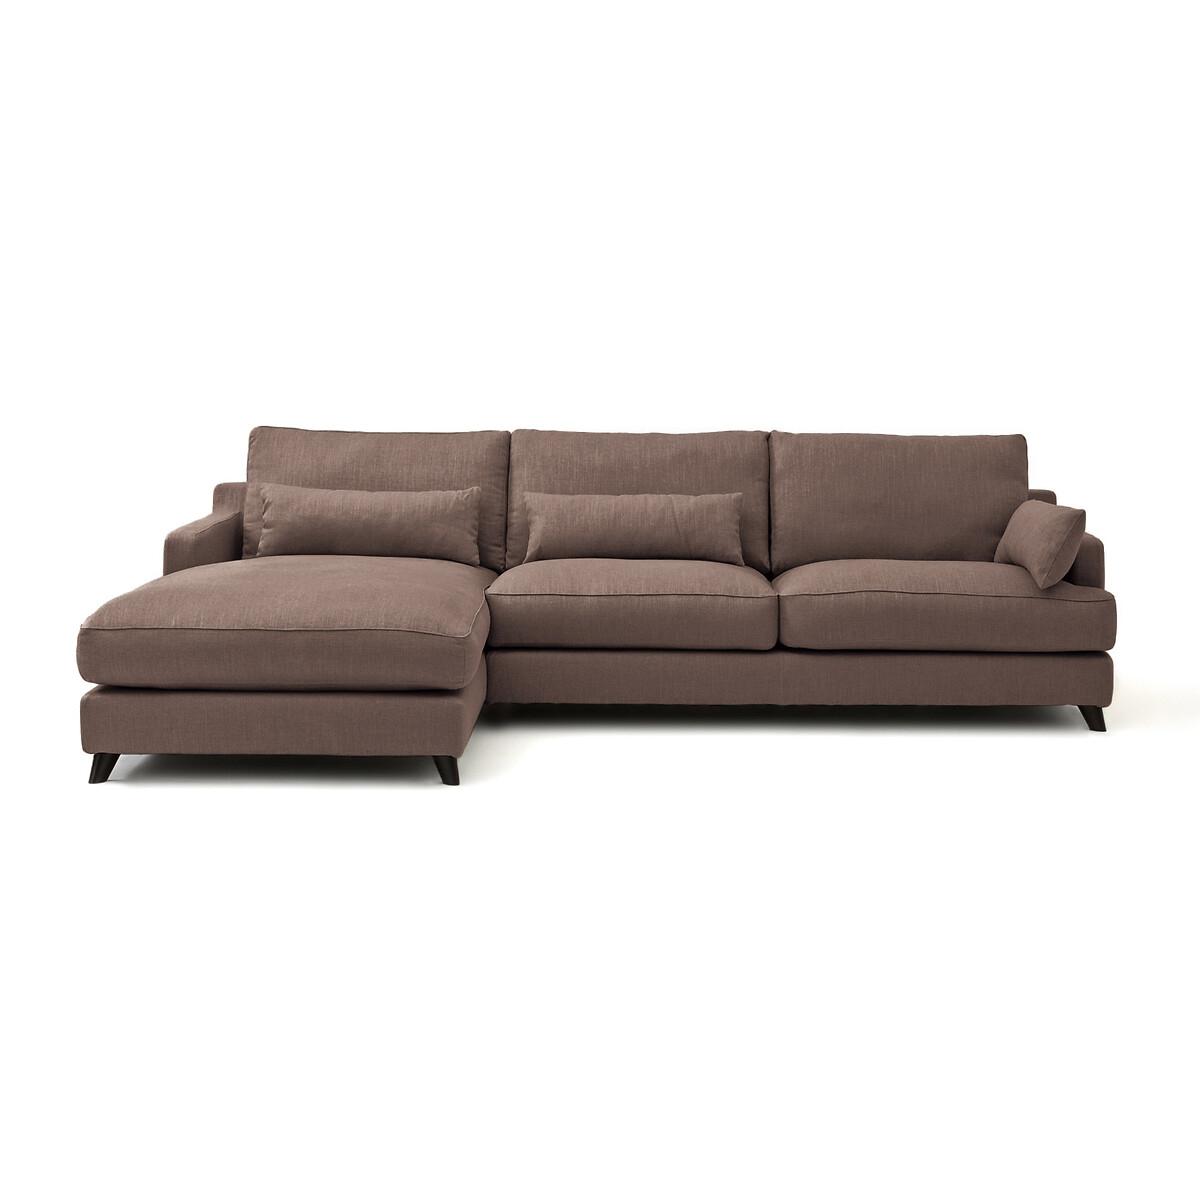 Canapé d'angle Tissu Luxe Contemporain Confort